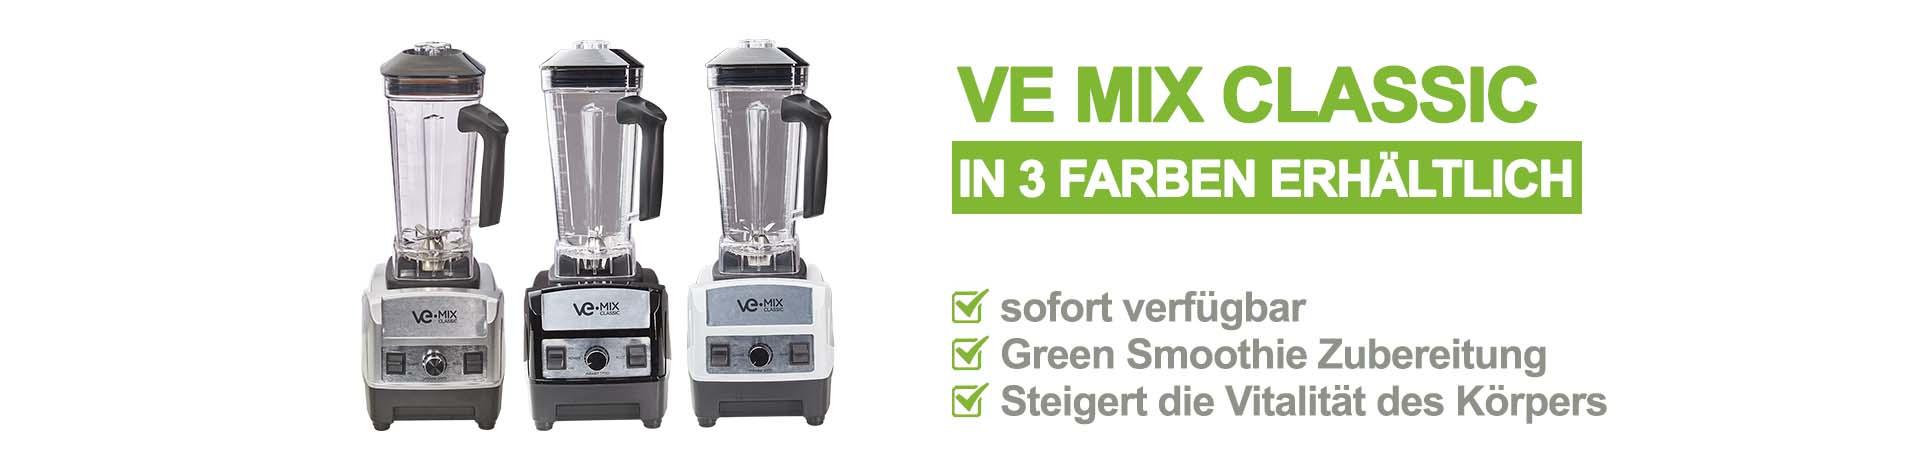 VE-MIX-CLASSIC-3-FARBEN